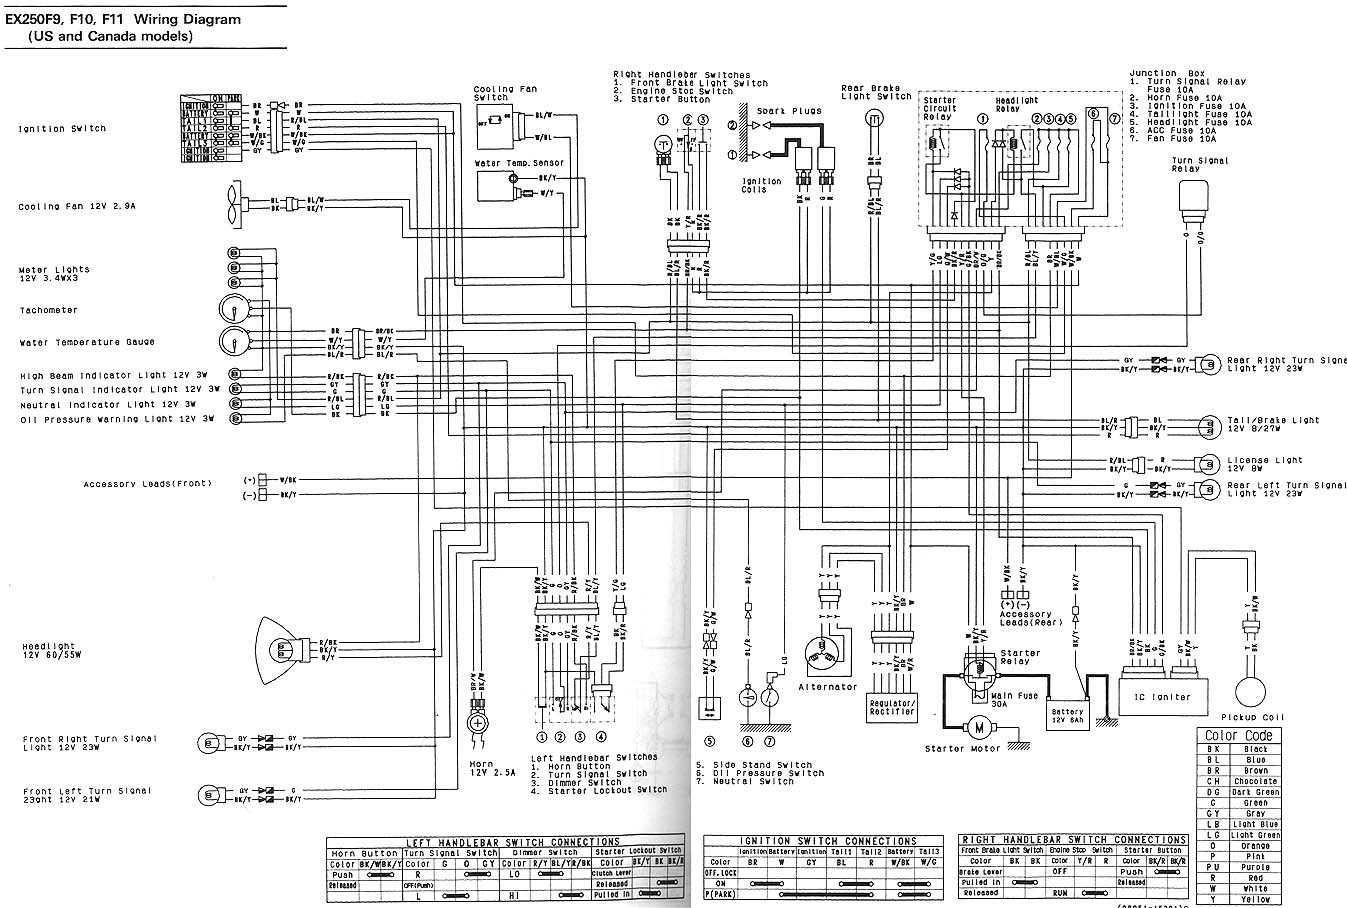 2000 Kawasaki Ninja Zx9r Wiring Diagram   Wiring Diagram on yamaha fz1 wiring diagram, honda rc51 wiring diagram, honda cbr600rr wiring diagram, zx7r wiring diagram, kawasaki zx7 specifications, honda st1100 wiring diagram, honda cbr900 wiring diagram,